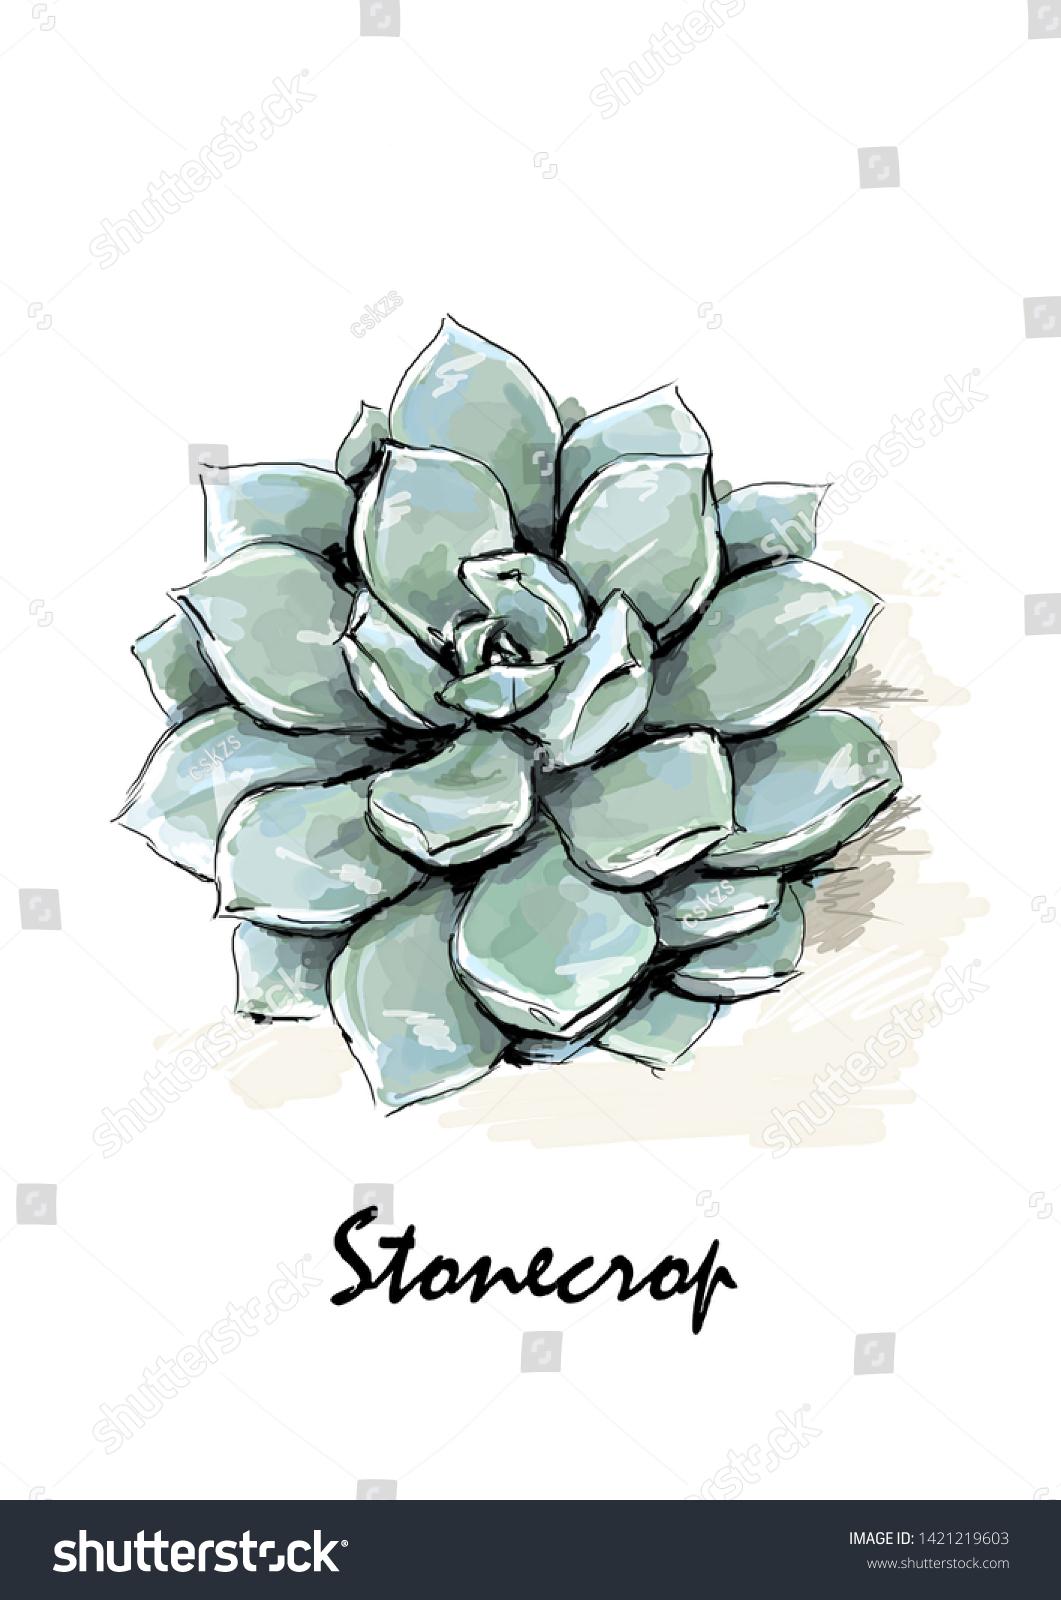 Stonecrop Plant Illustration Digital Watercolor Stock Illustration 1421219603